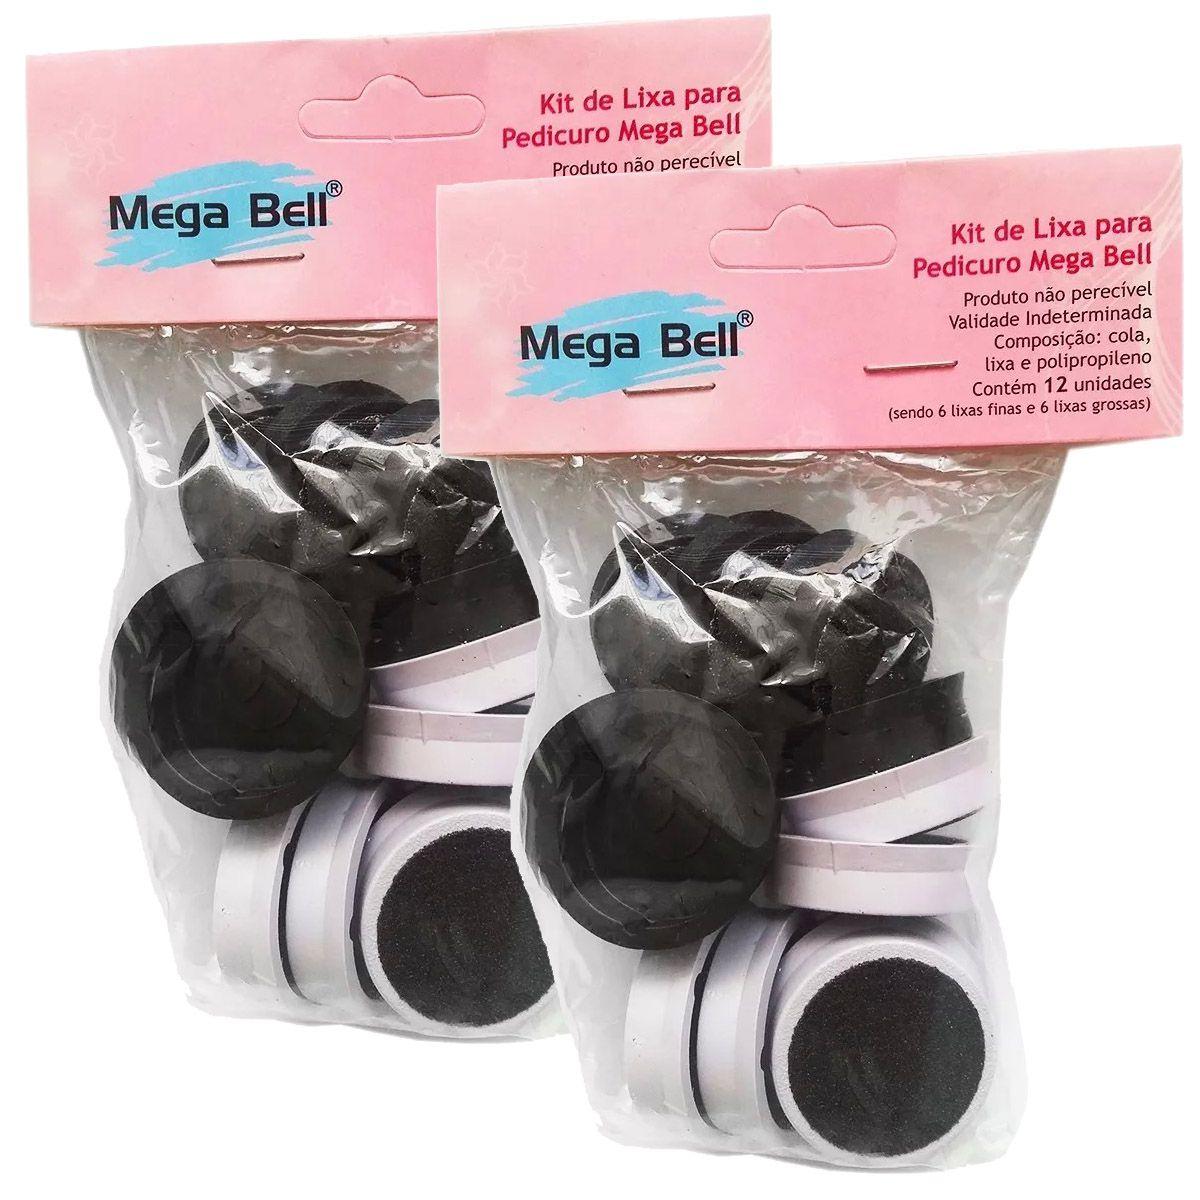 2 Refil Lixa Pedicuro Megabell - 24 Lixas